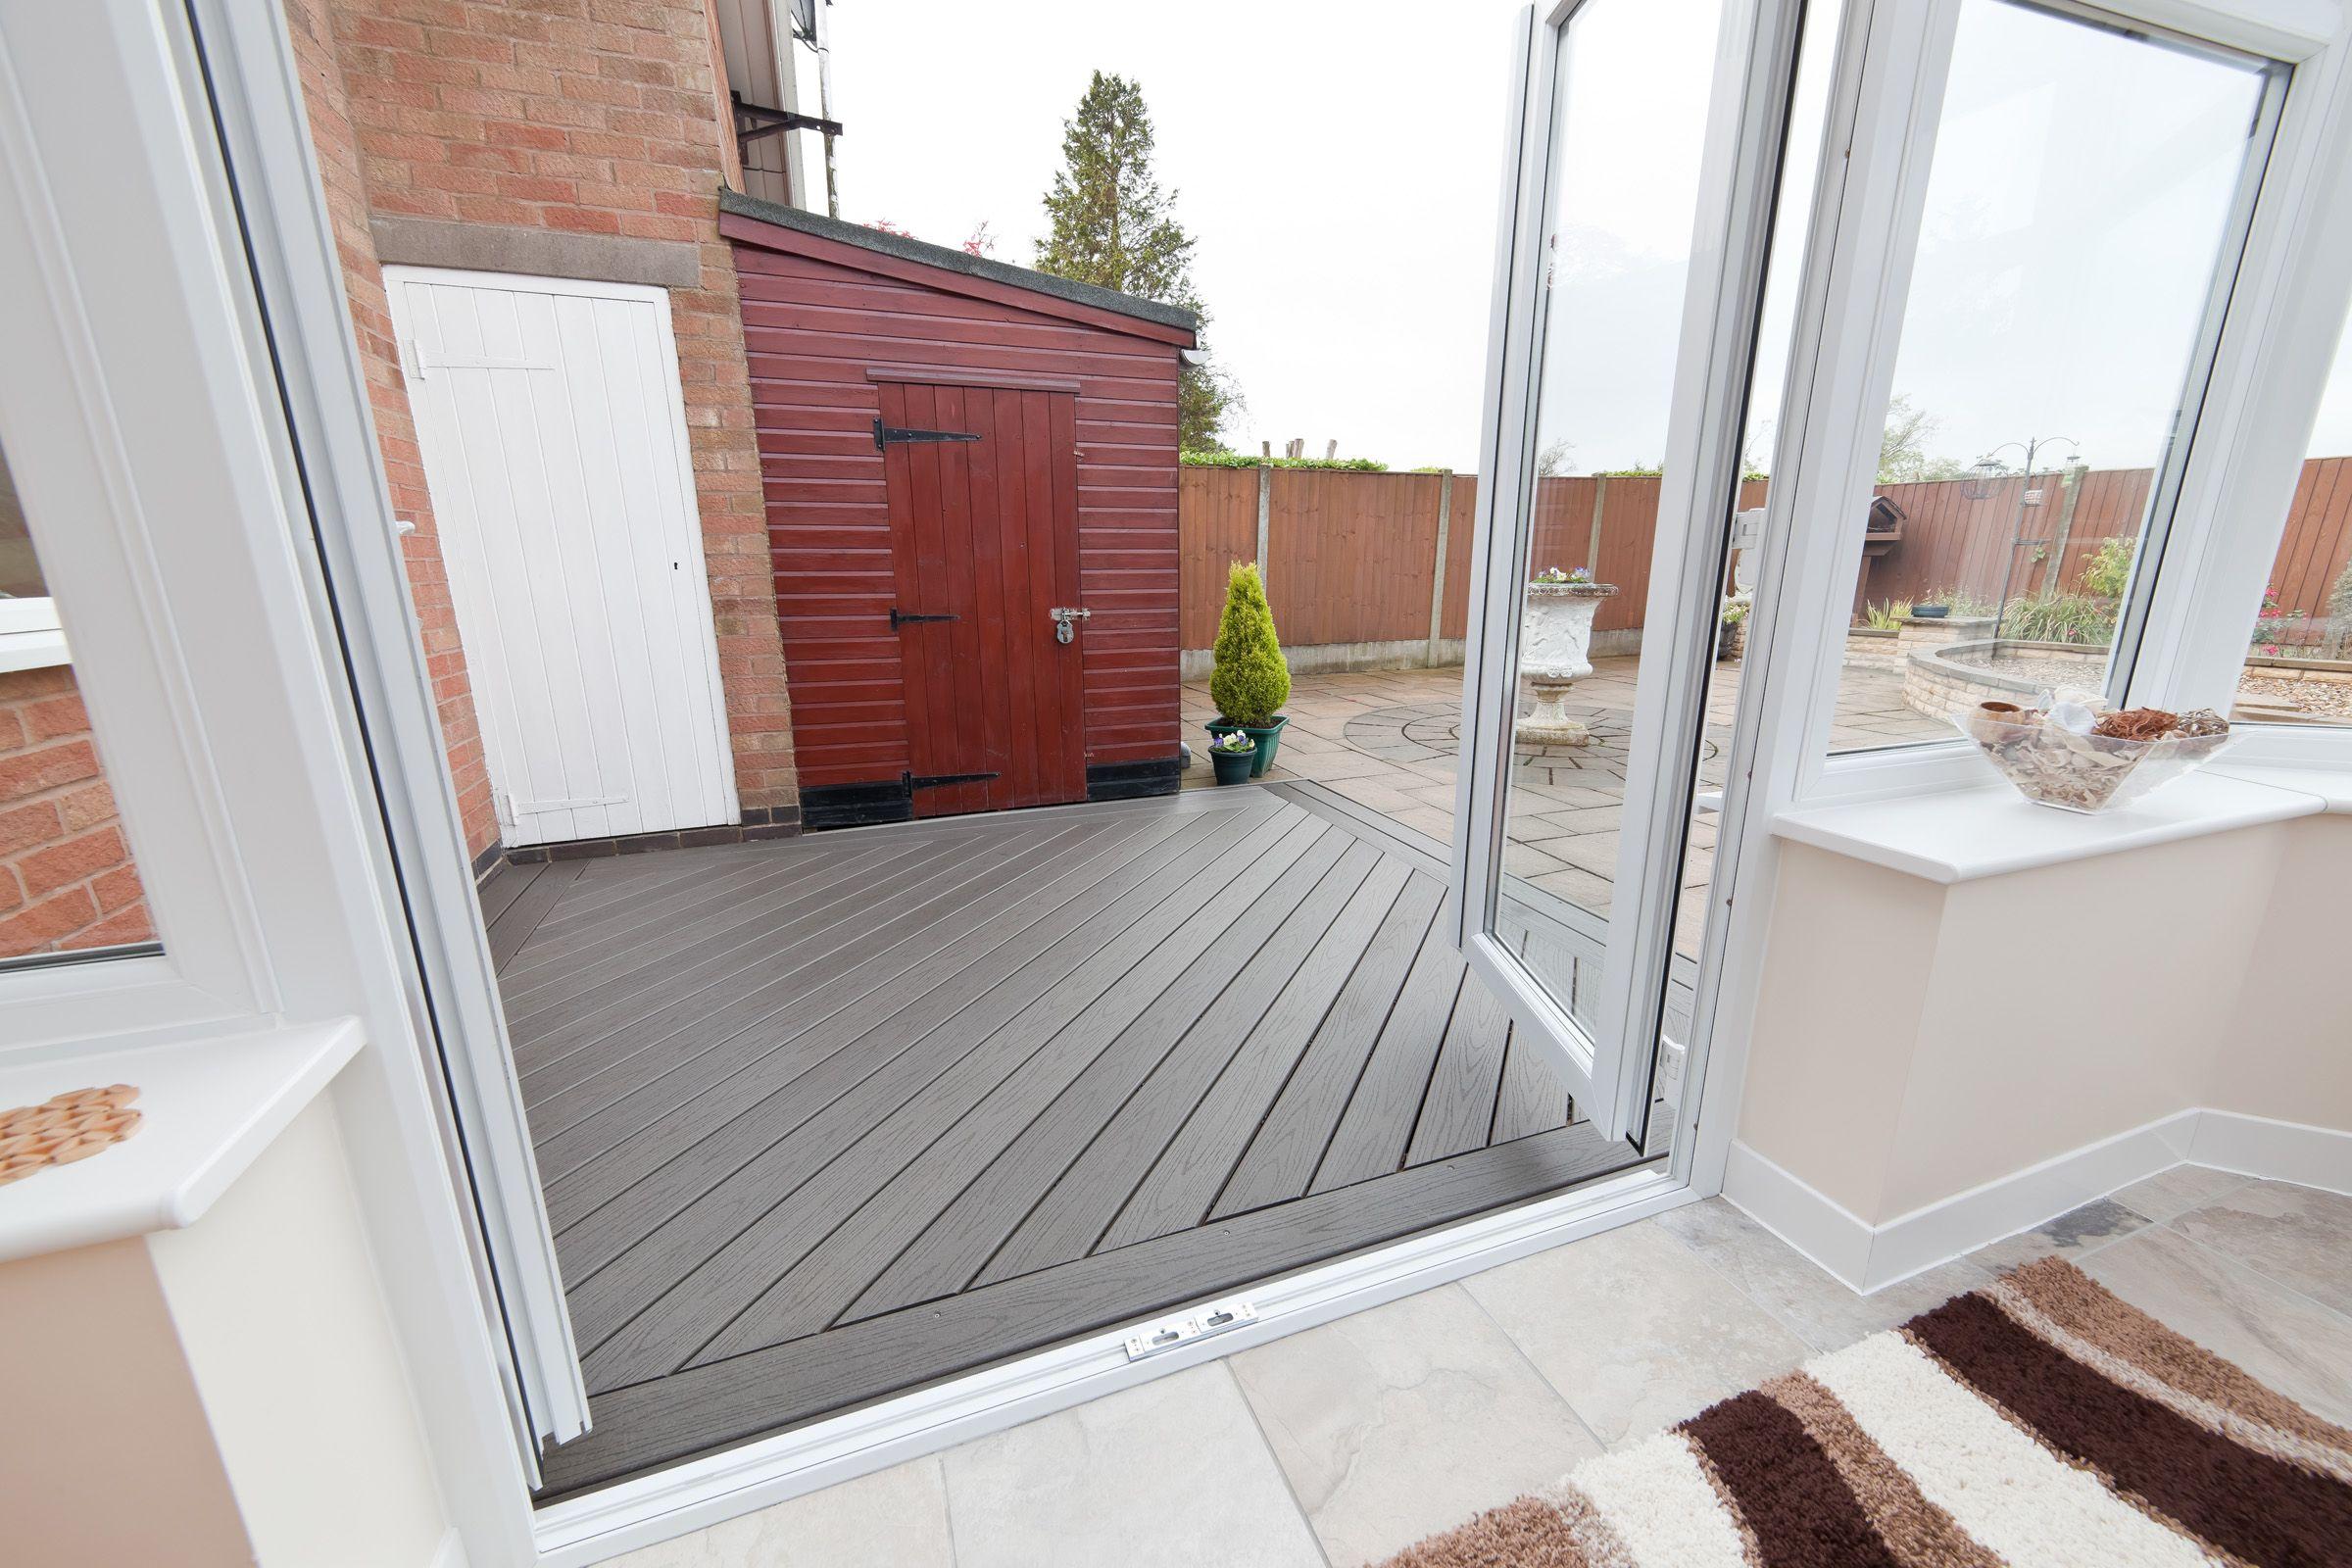 outside wedding floor for uneven ground,deck veneer lowes